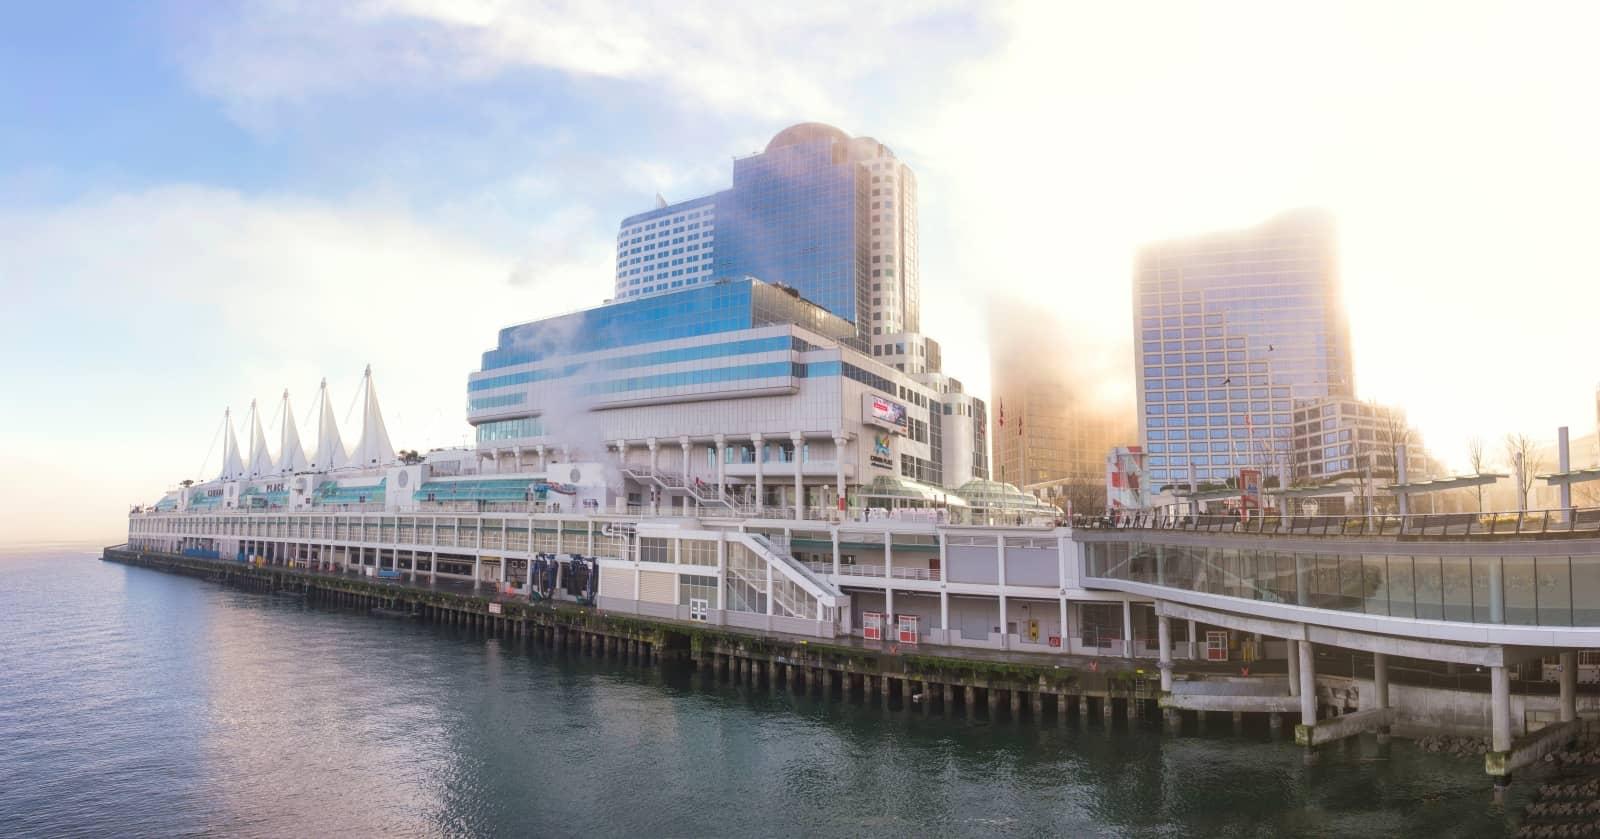 Canada Place Vancouver mit Anlegestelle der Kreuzfahrtschiffe Foto rgbspace